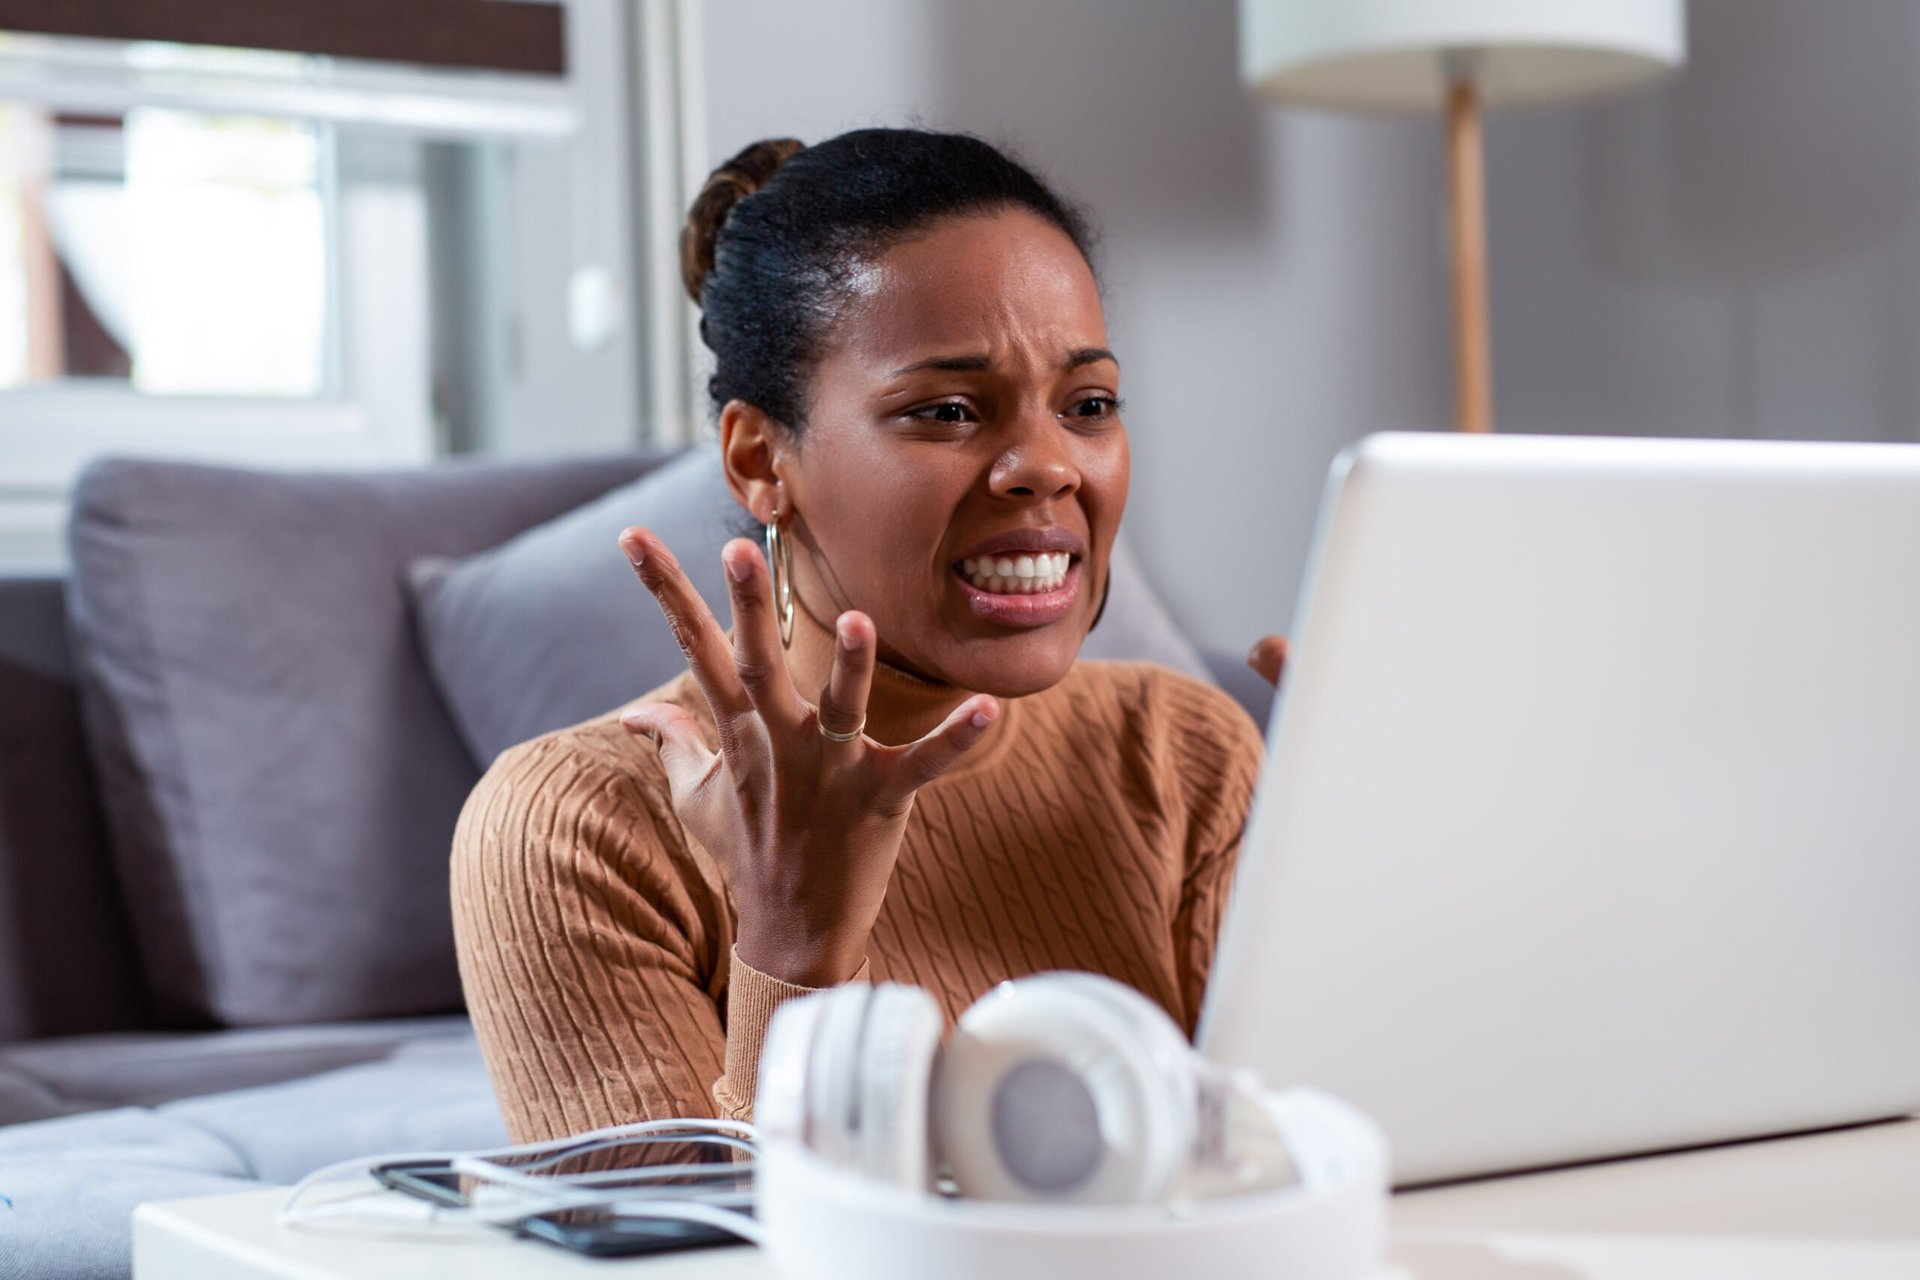 Upset woman using a laptop computer